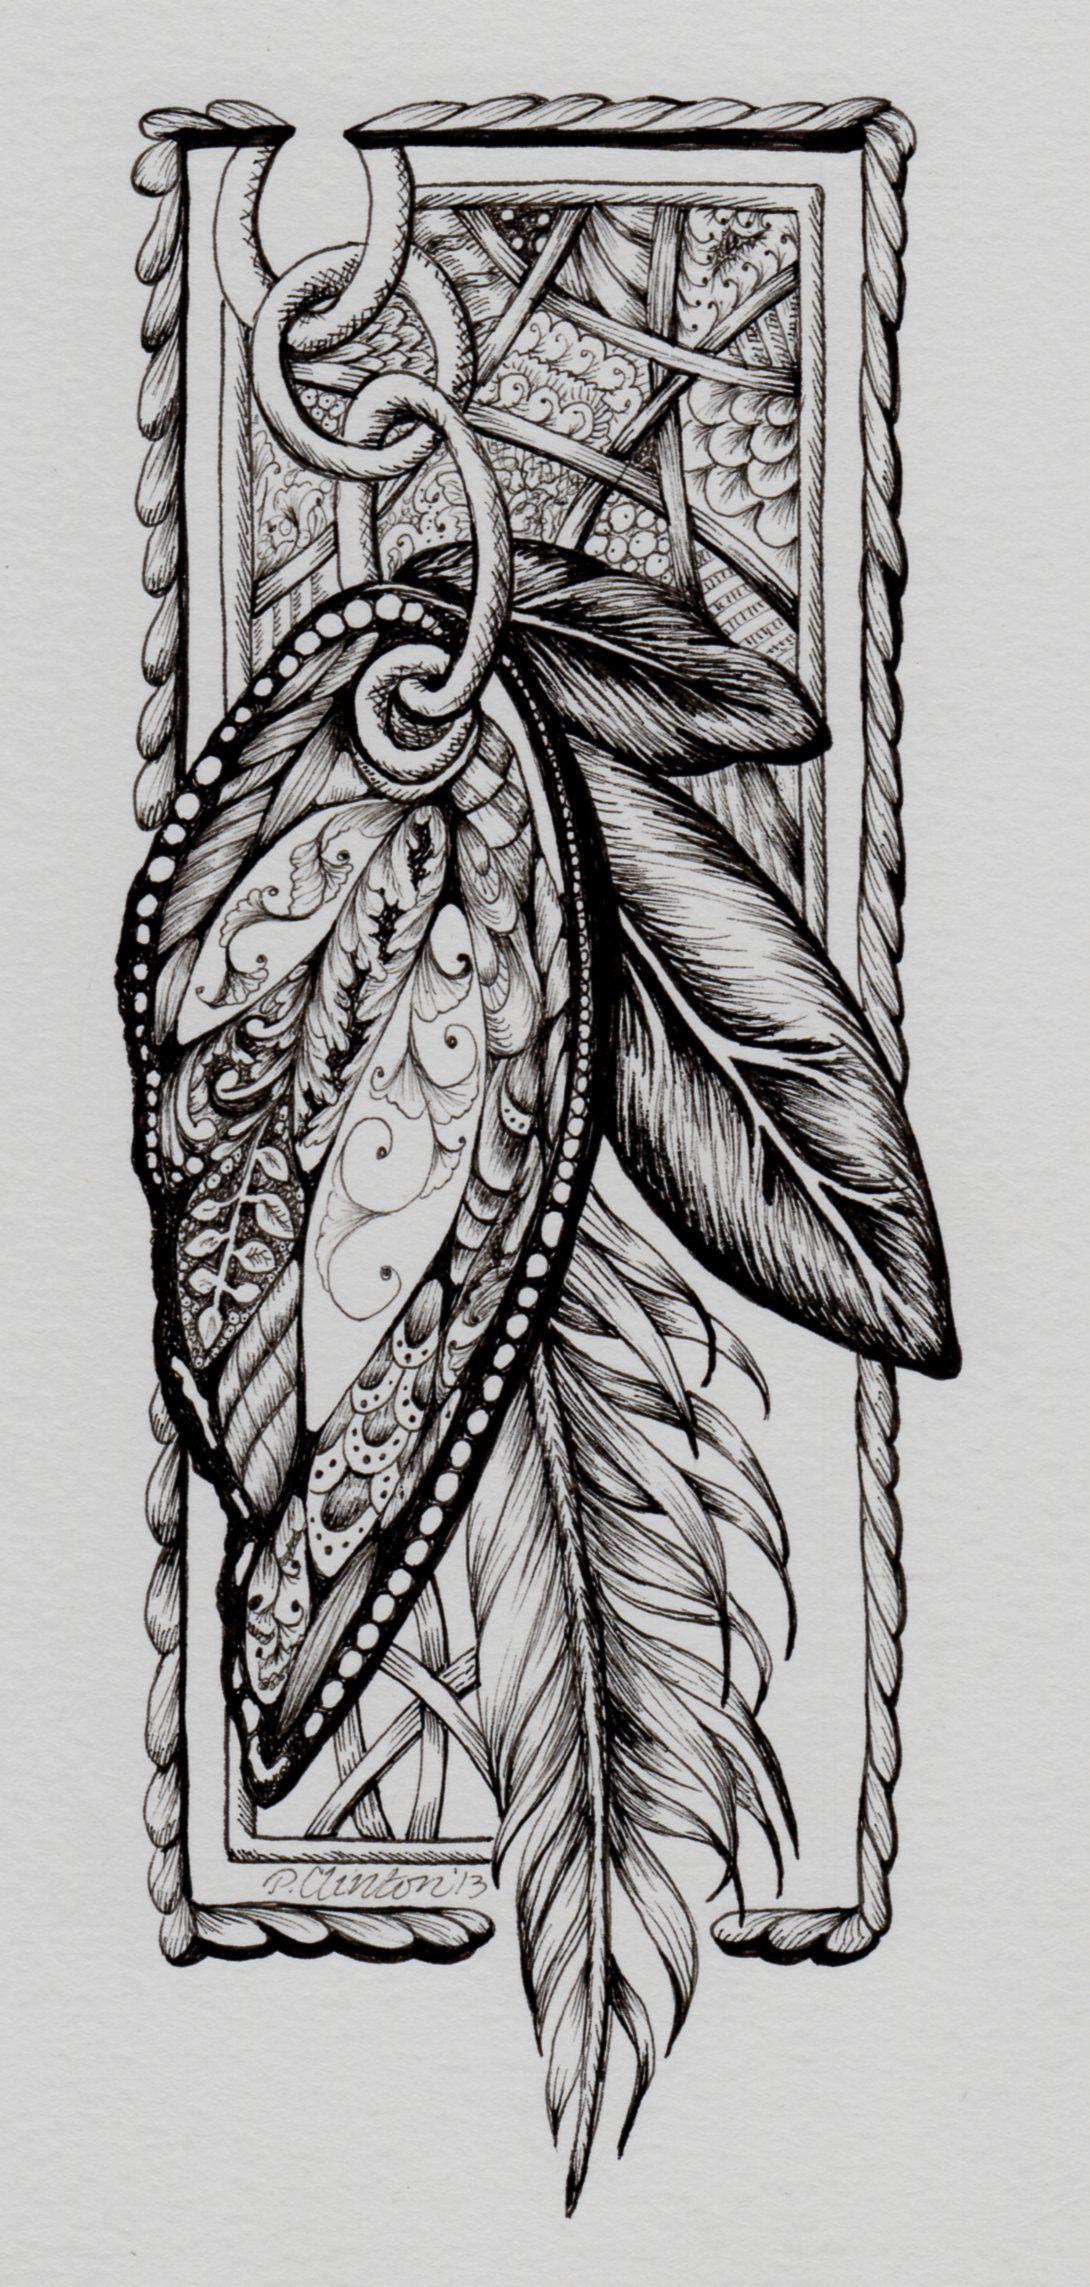 Zentangle by P Clinton Butterfly Feather Flutters art Pinterest